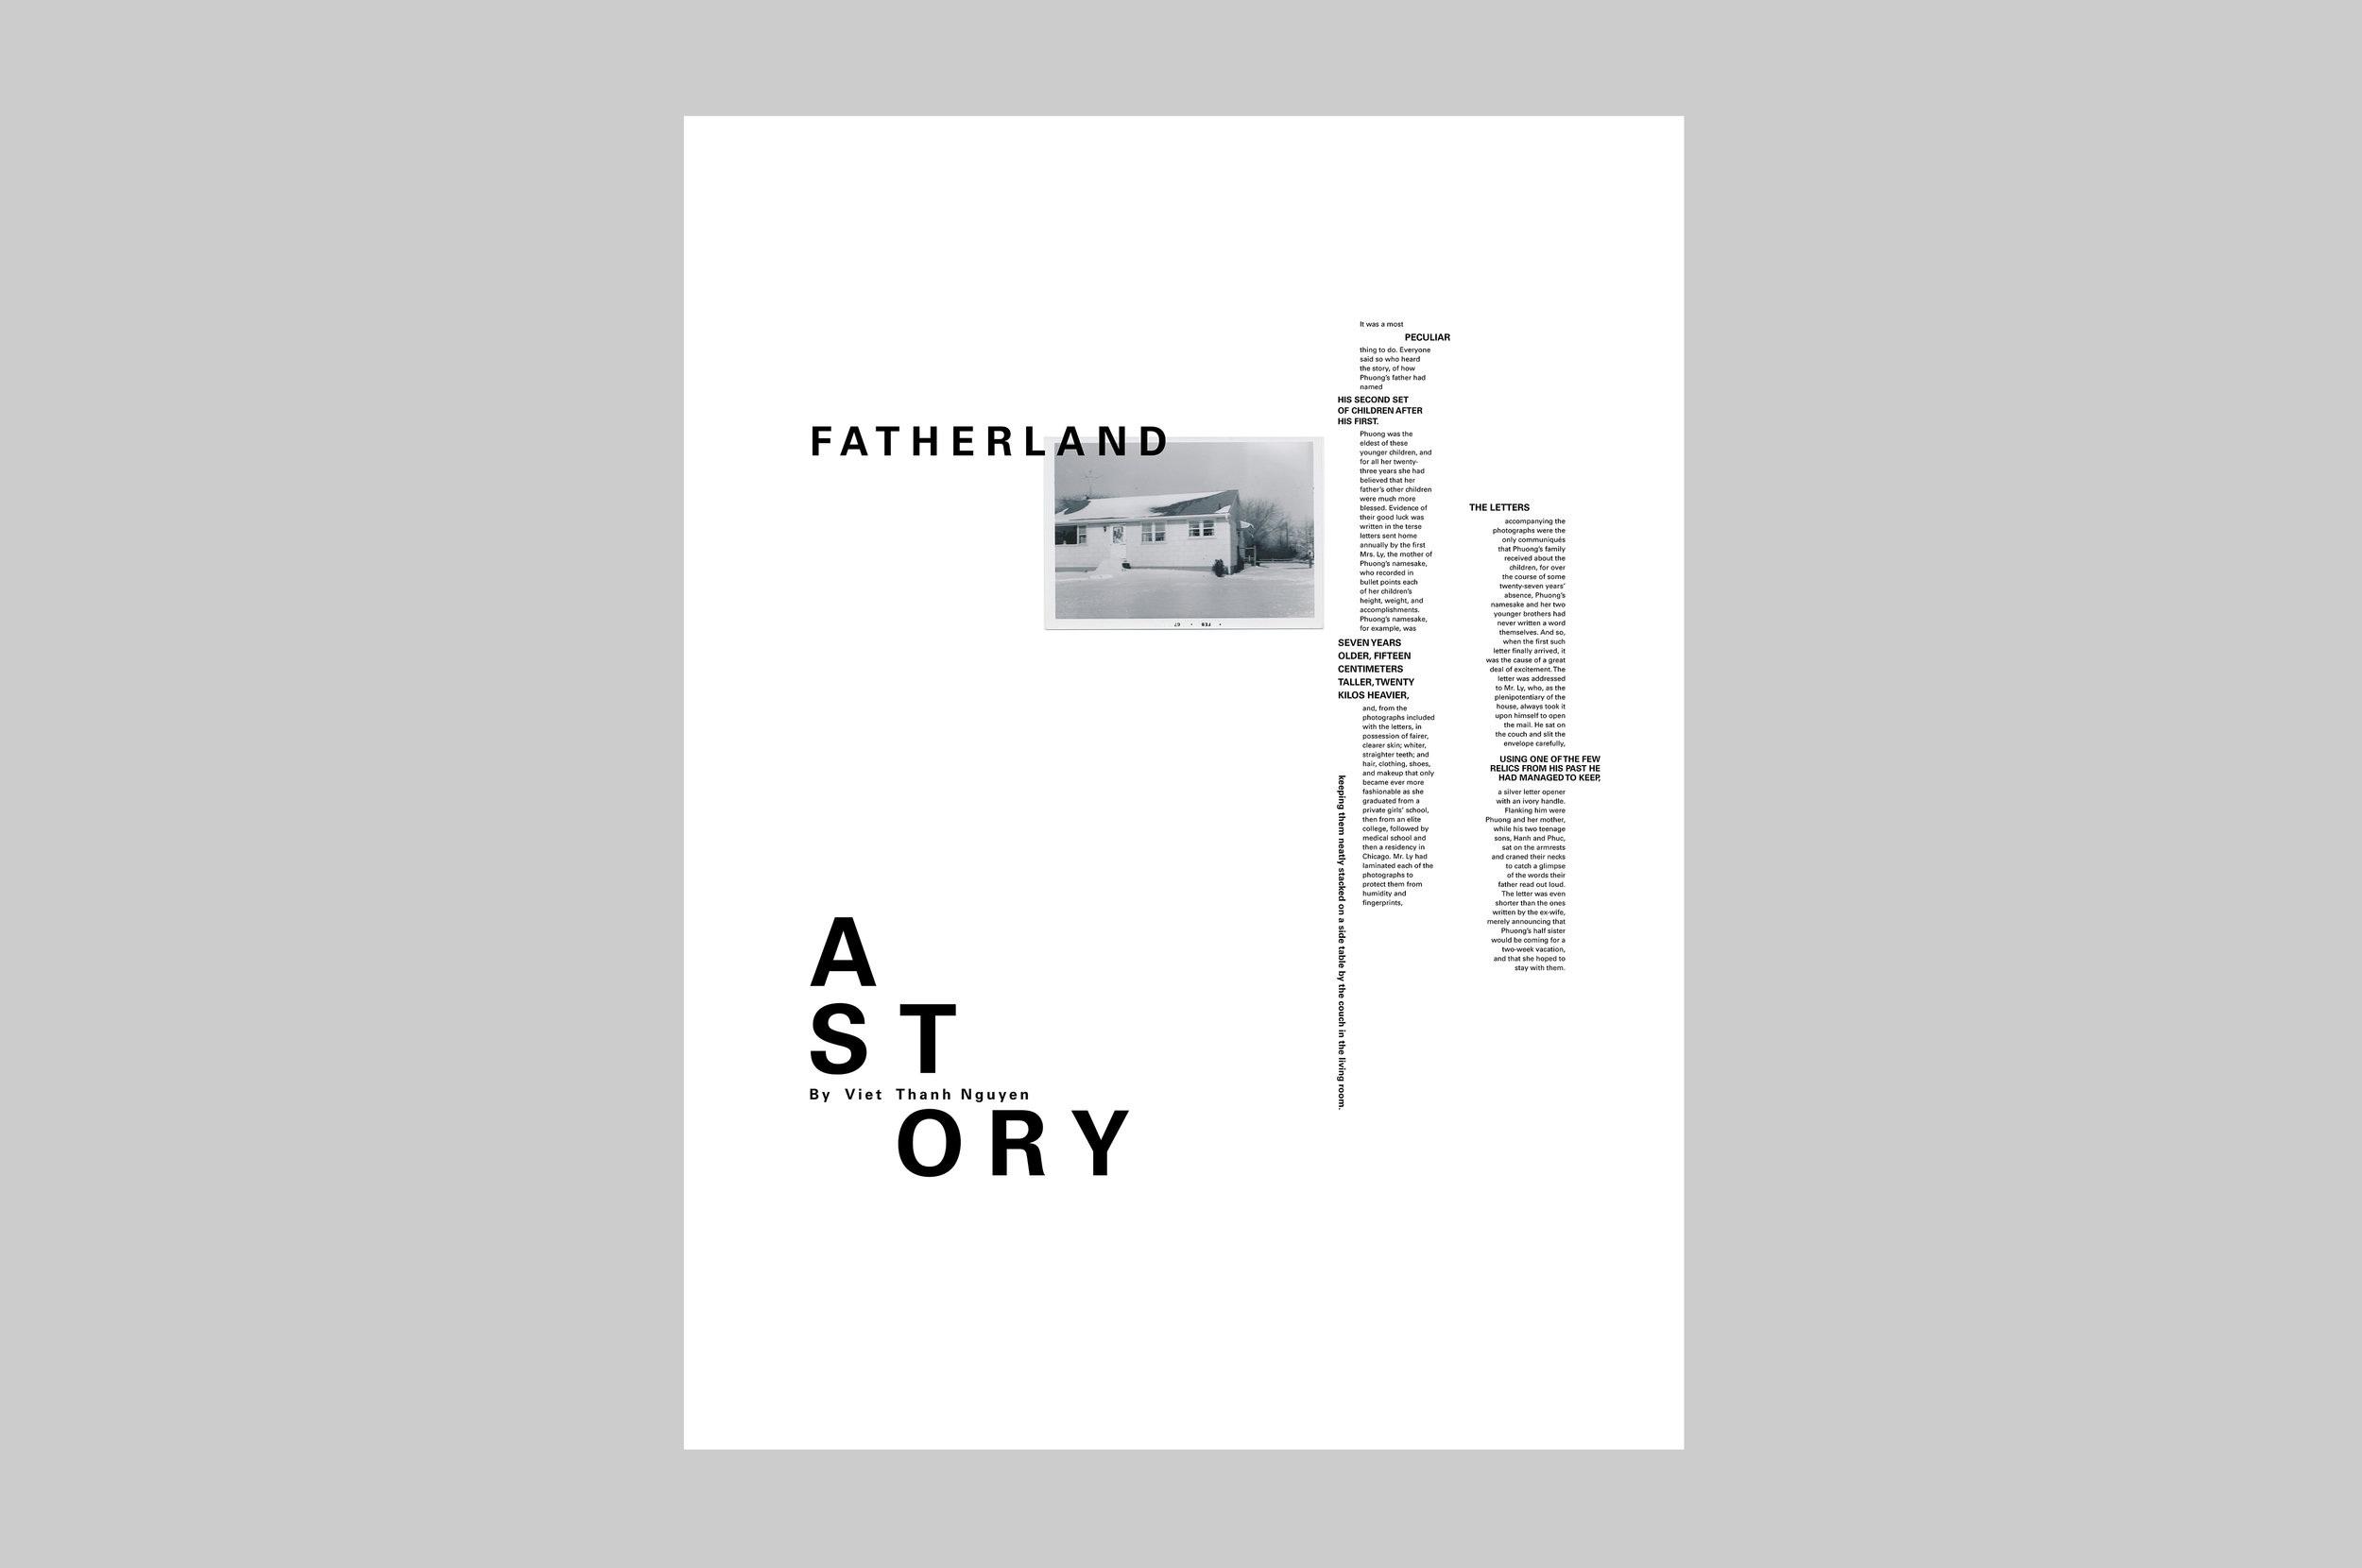 AndersonE_Fatherland_Poster01.jpg